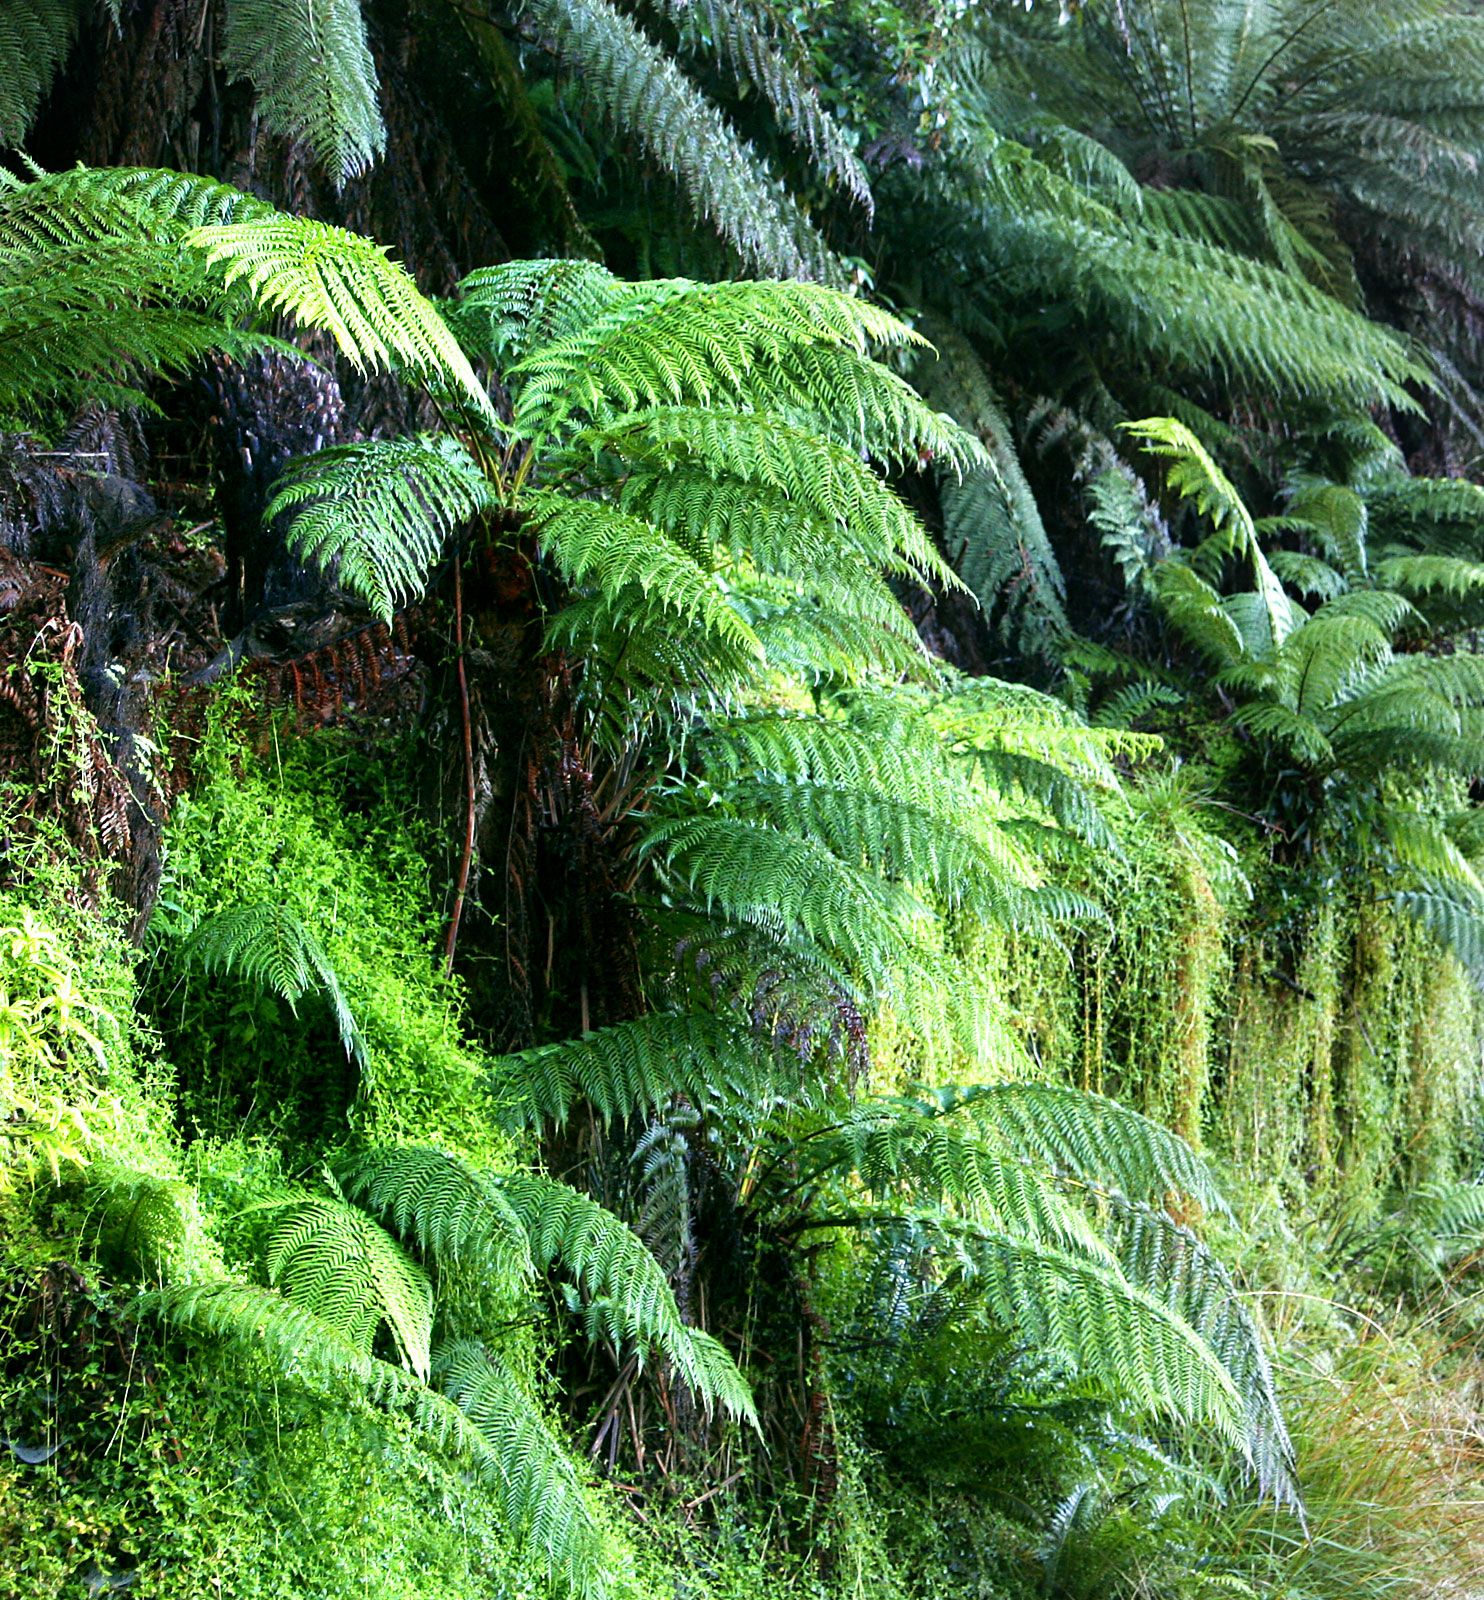 Dicksonia Antarctica Fern Tree Ferns Probably Dicksonia